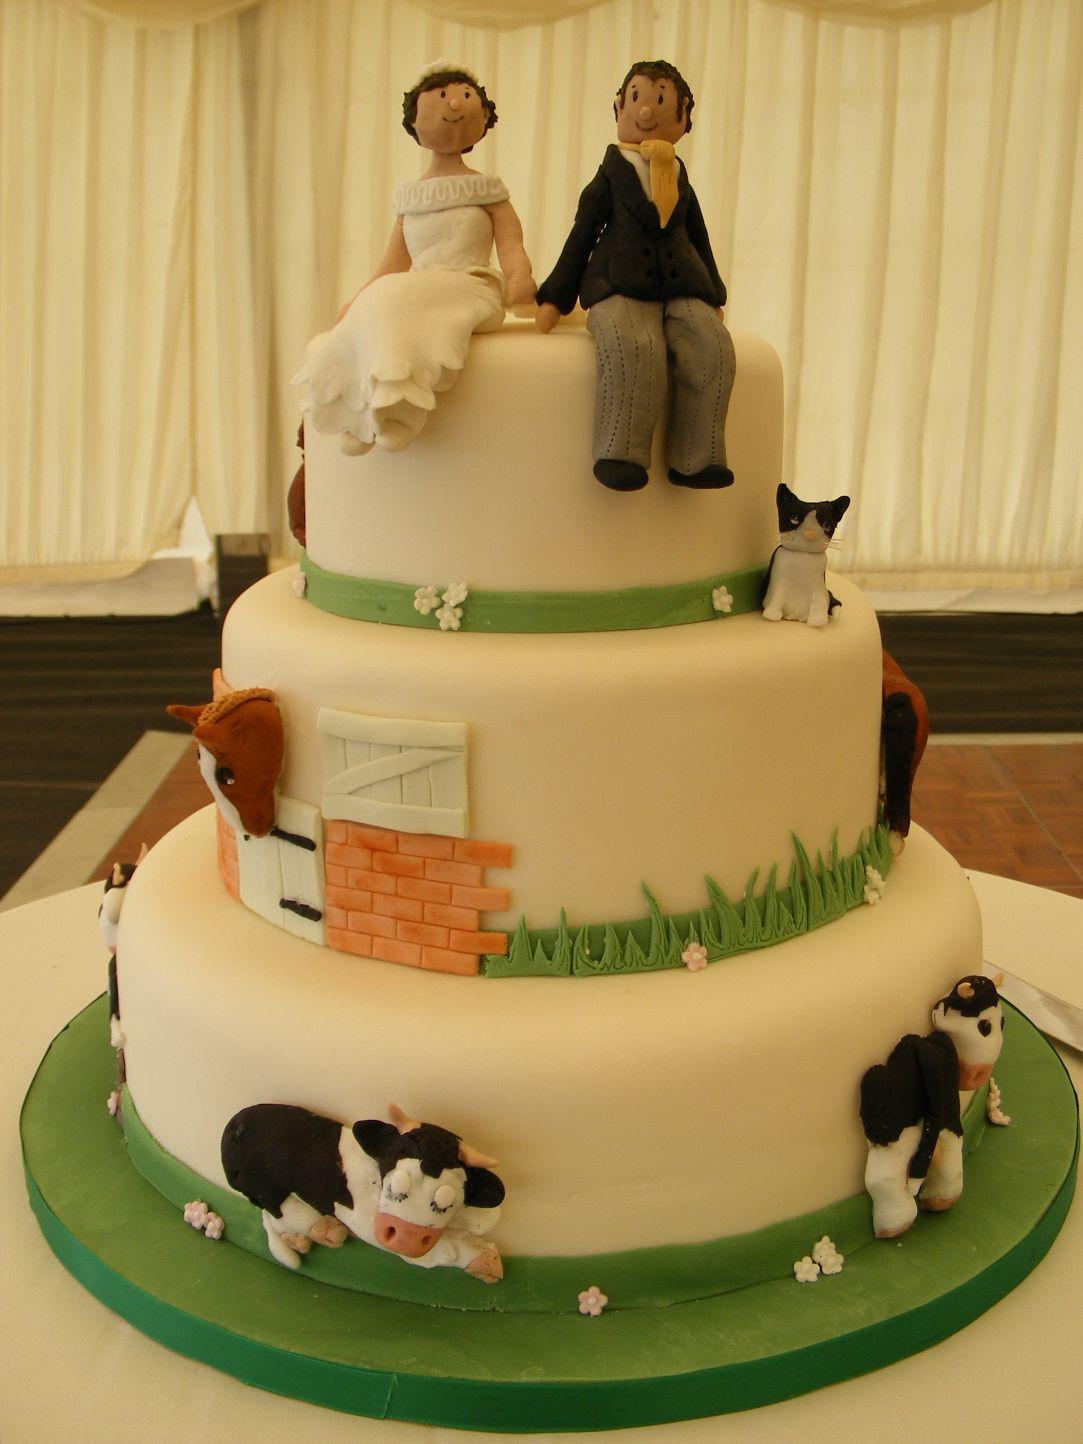 Farm Wedding Cake Lol Cakes Pinterest Wedding Cake Farming